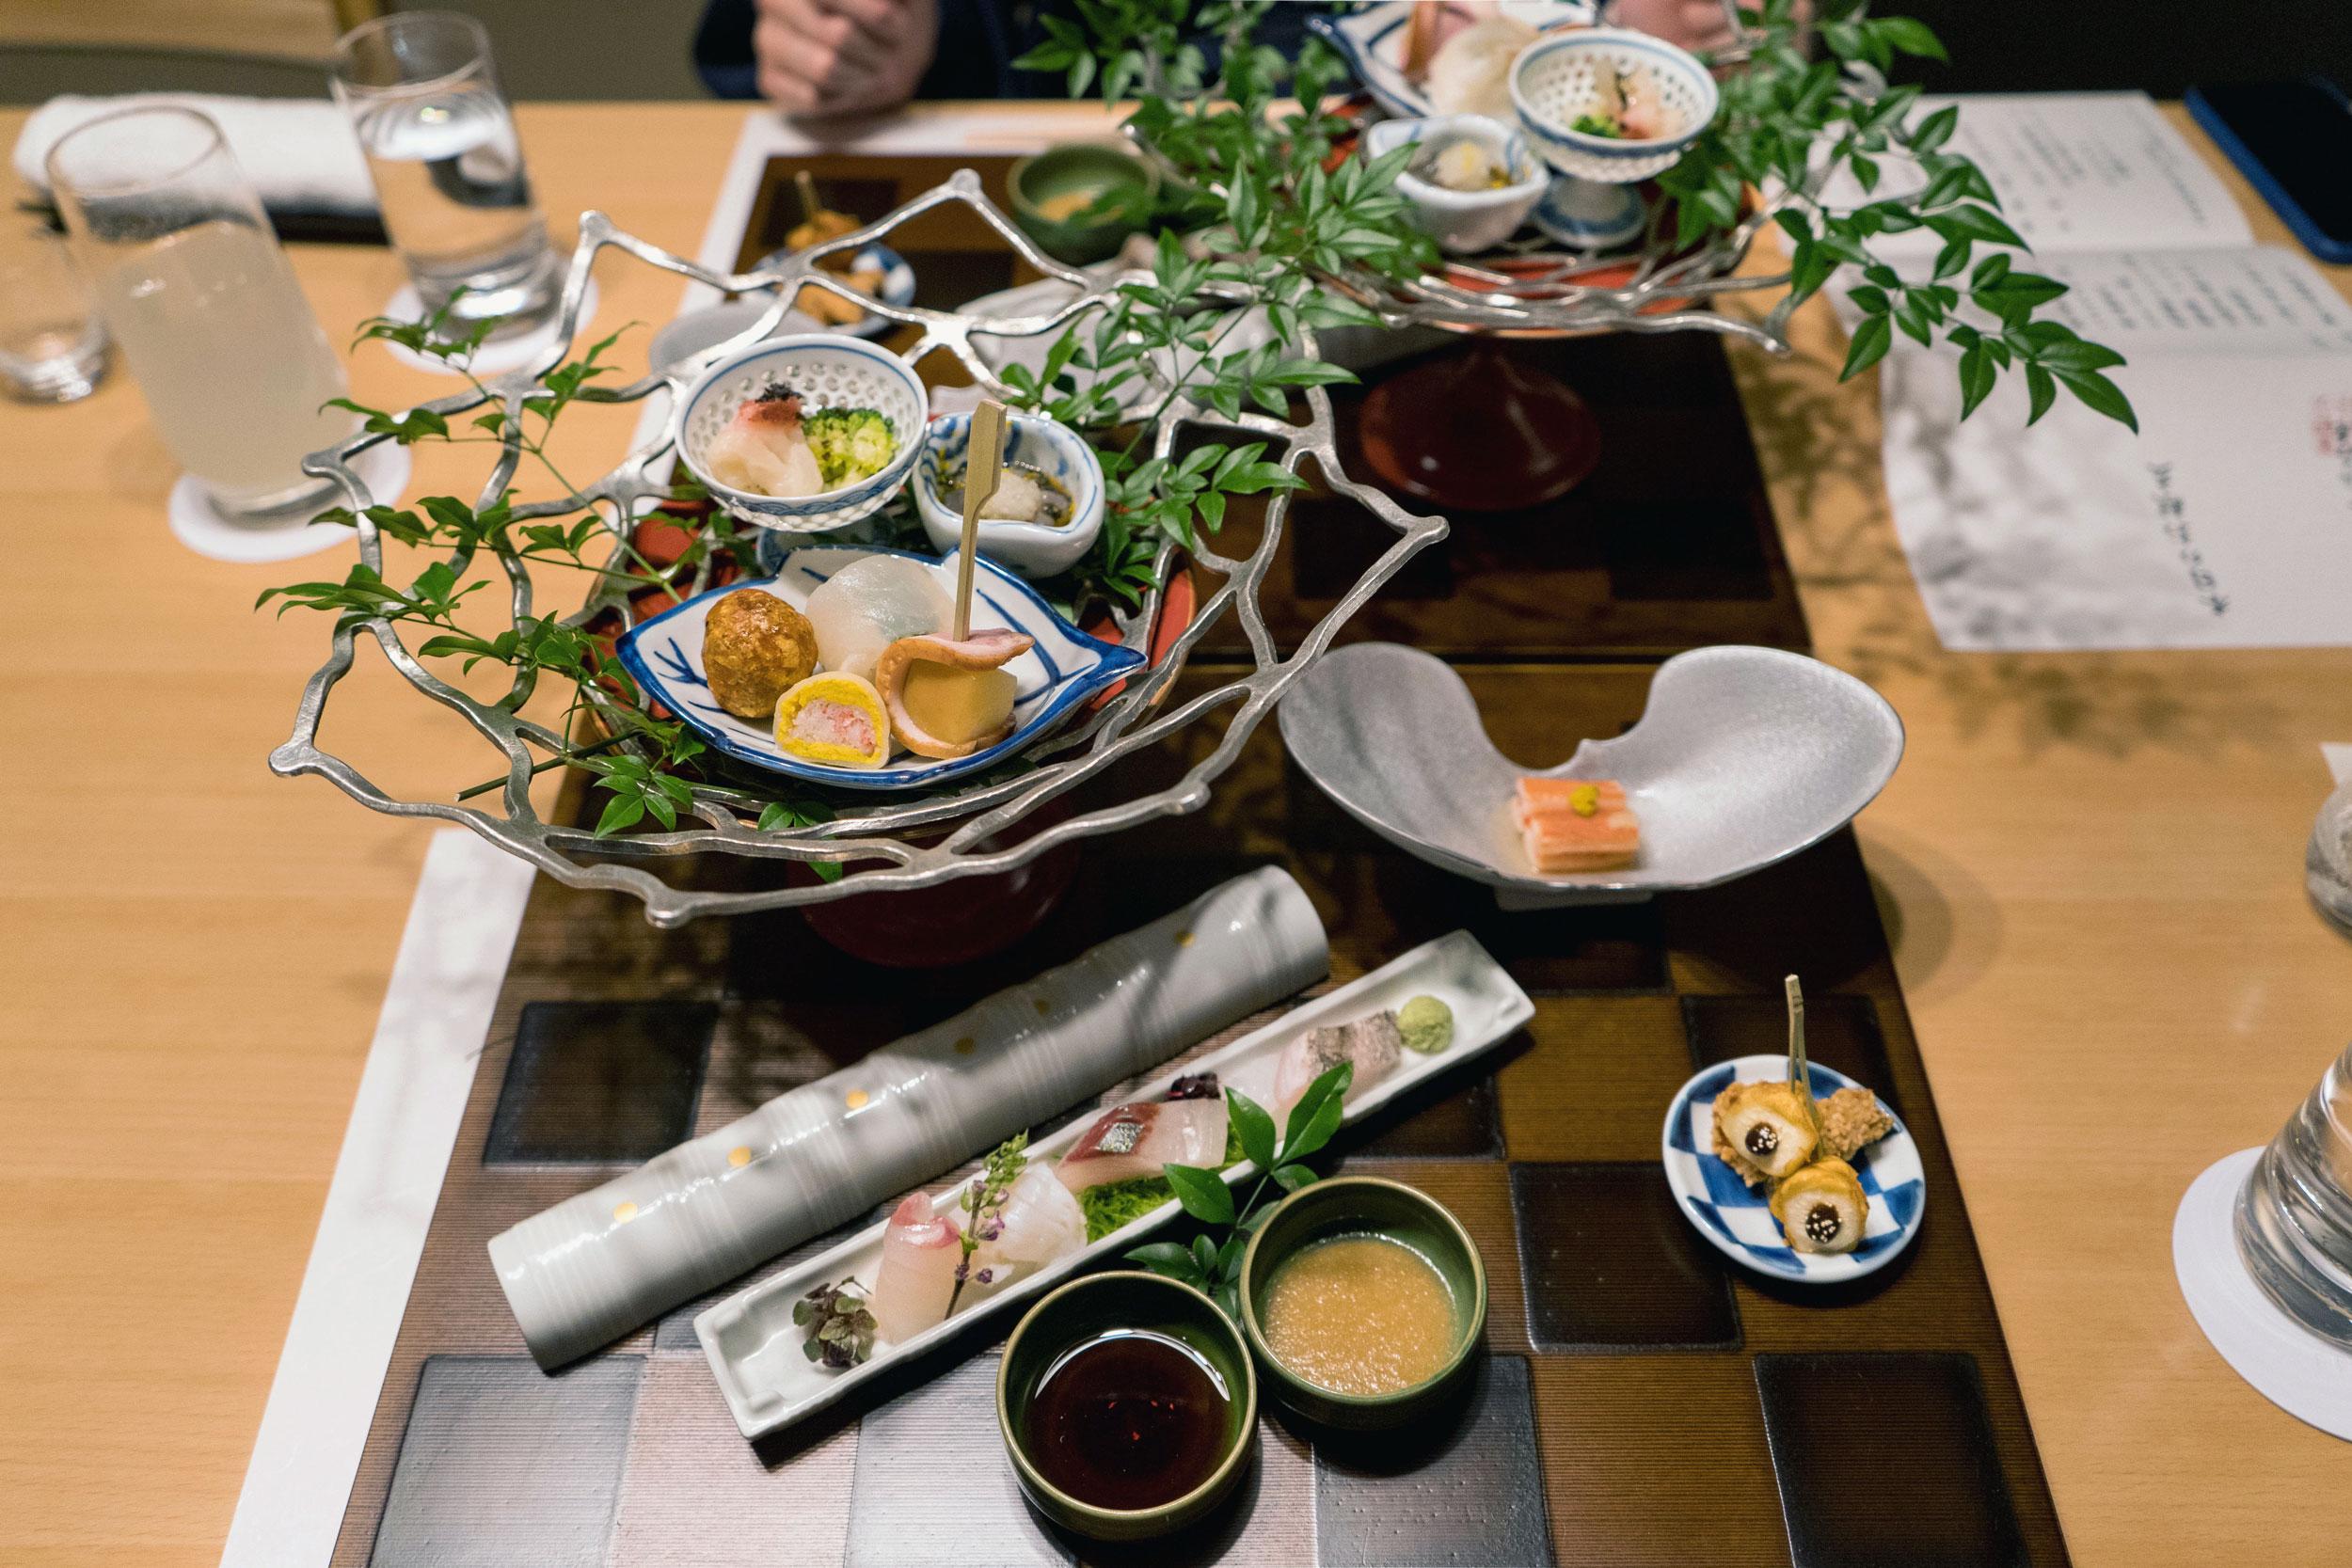 hakone-2019.02-hoshinoresorts-kai-sengokuhara-08-dinner-04.jpg